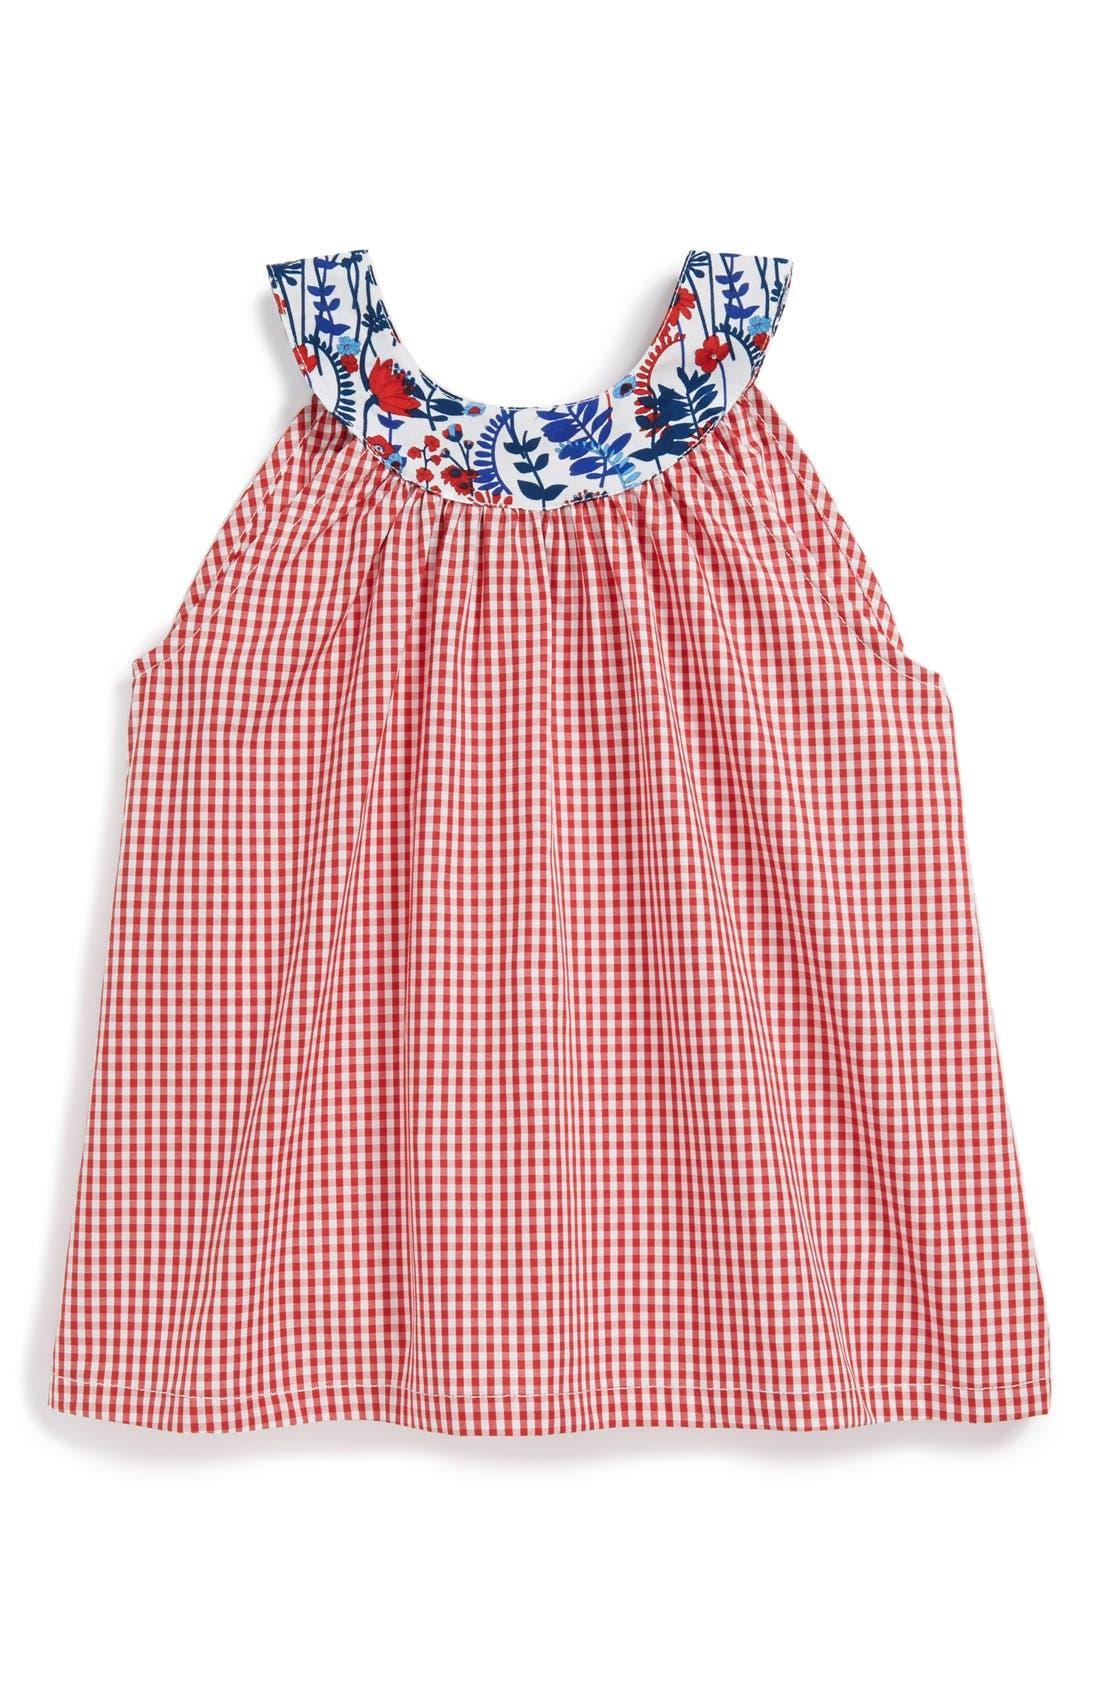 Alternate Image 1 Selected - Oscar de la Renta 'Circle' Check Tank Top (Toddler Girls, Little Girls & Big Girls)